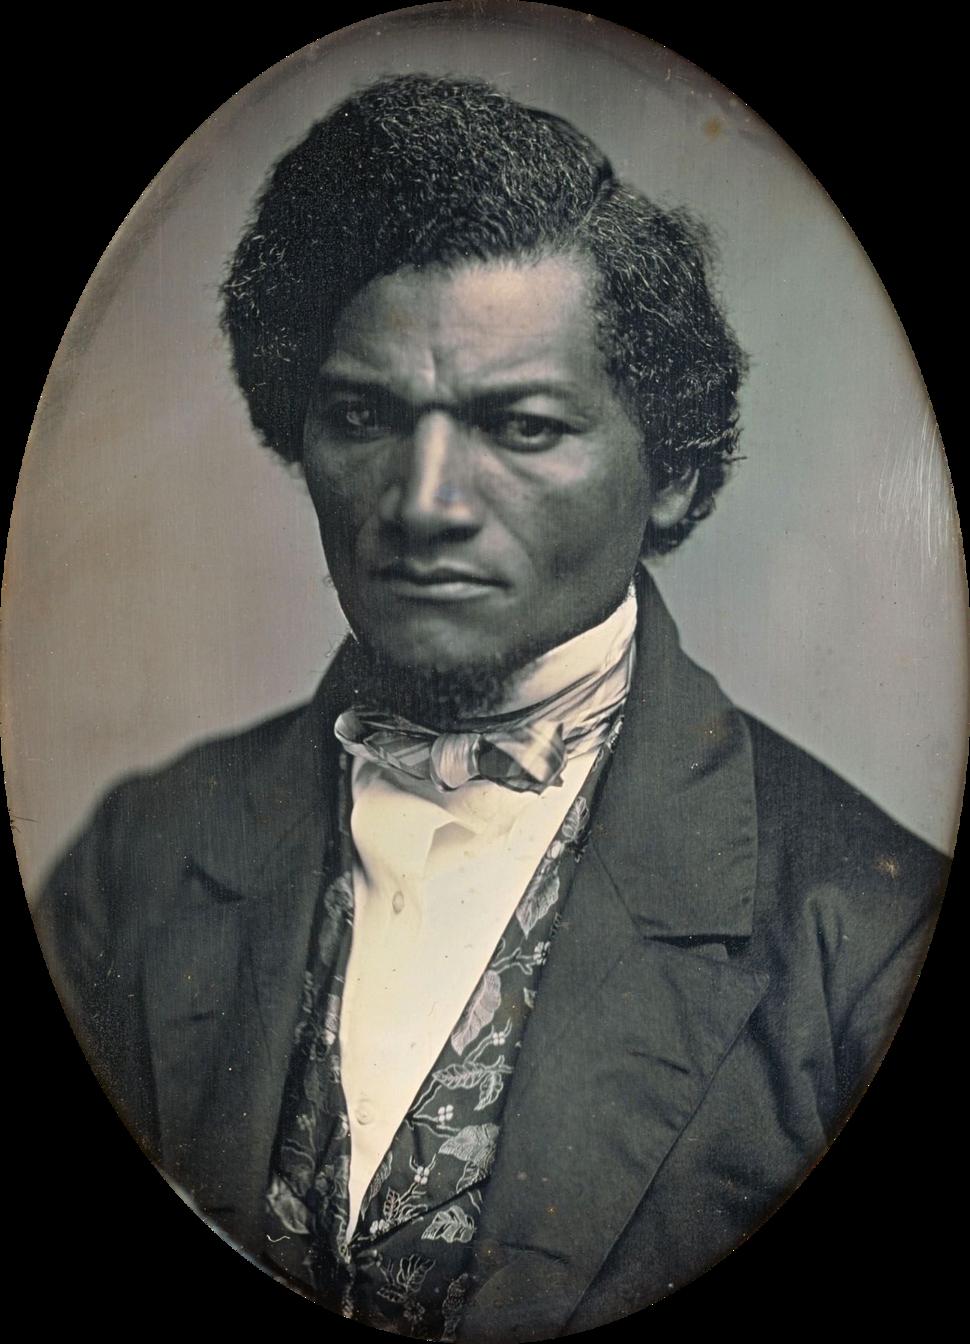 Frederick Douglass by Samuel J Miller, 1847-52